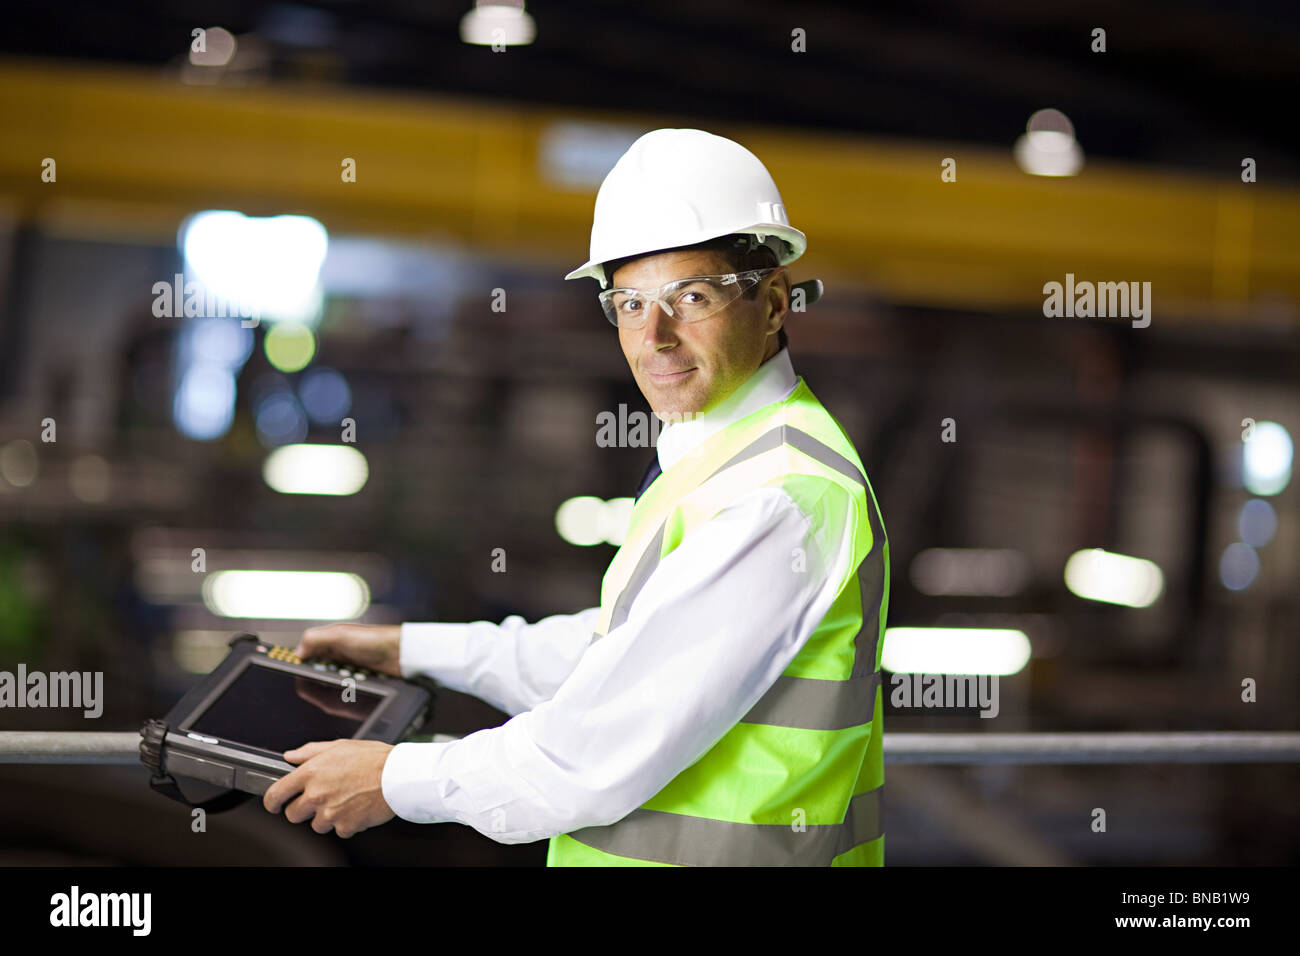 Engineer with handheld computer - Stock Image